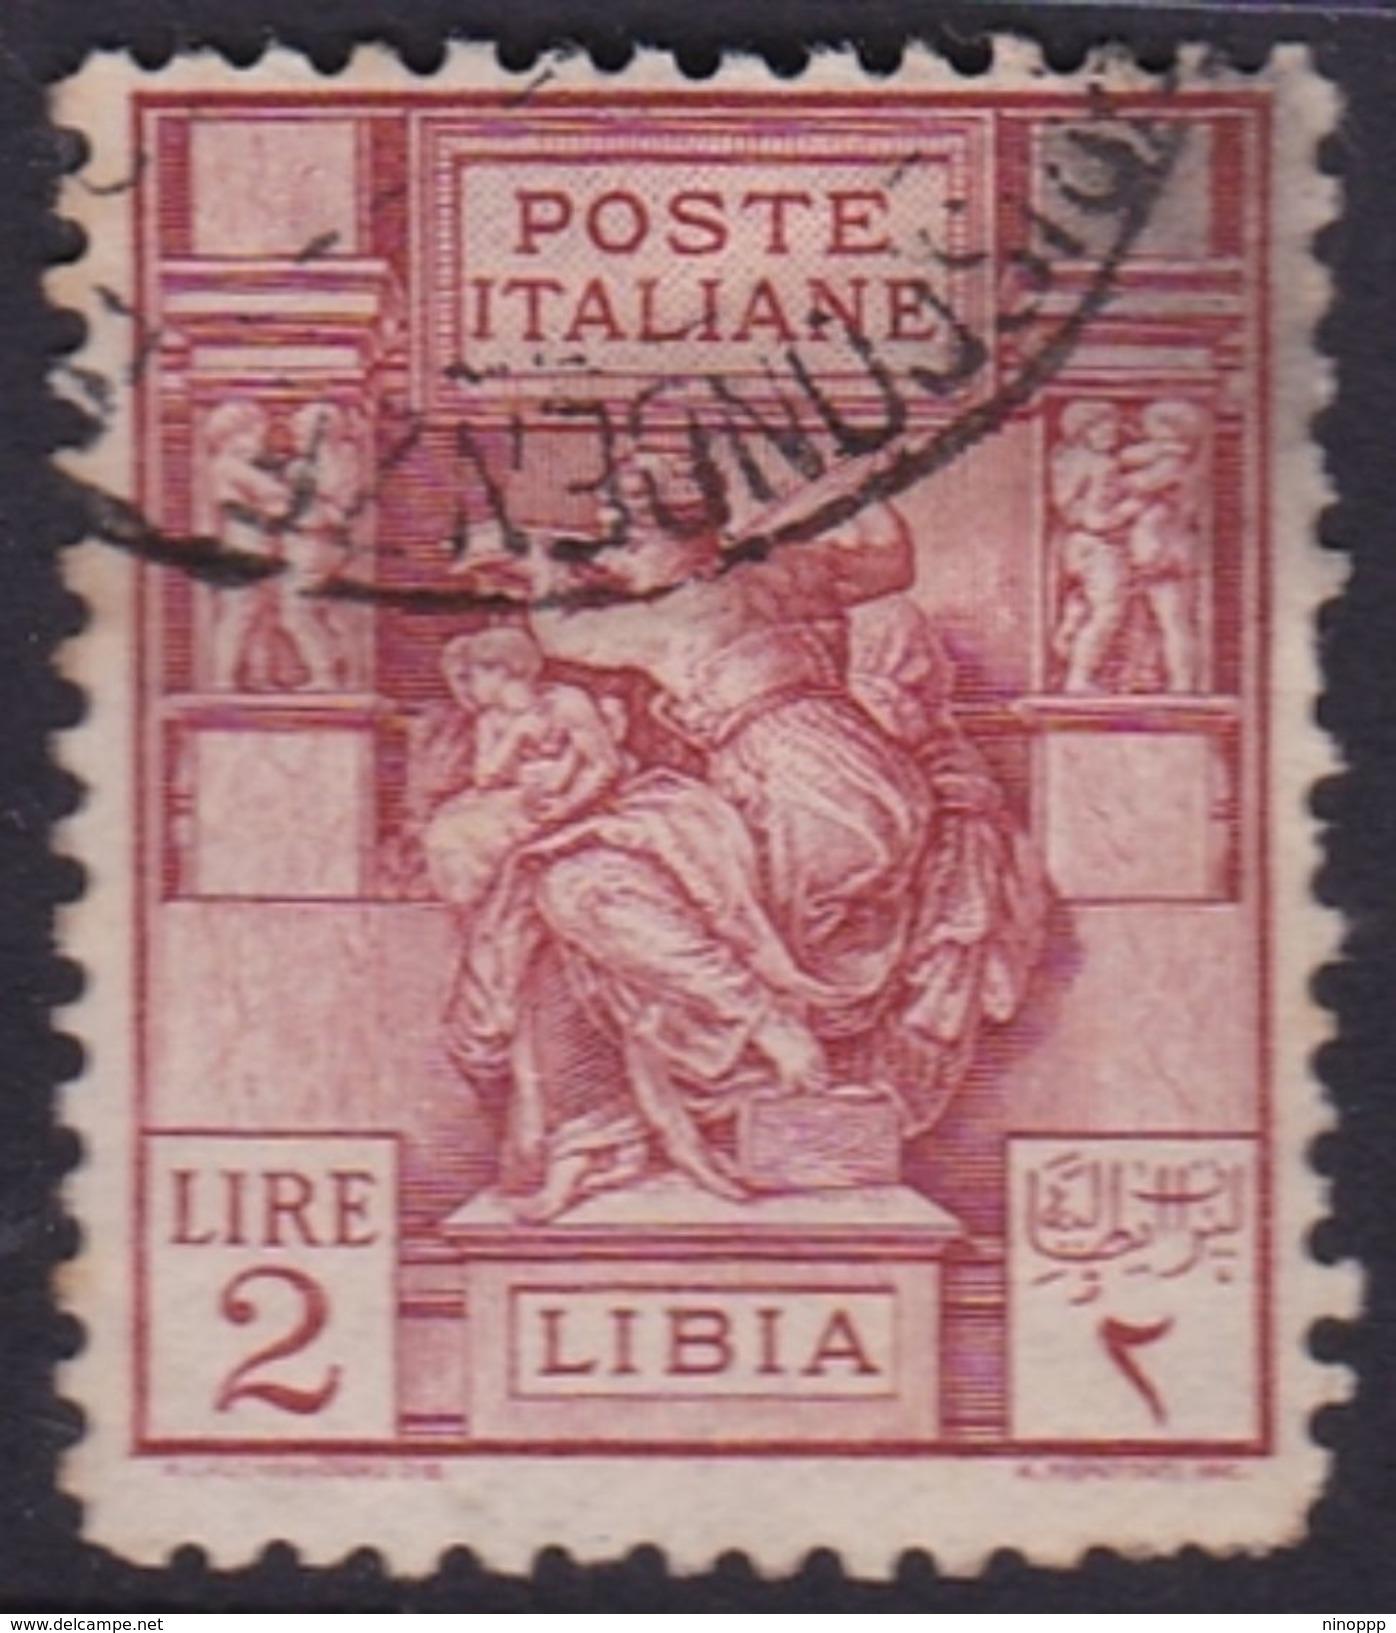 Italy-Colonies And Territories-Libya S 57 1926-29 ,Libyan Sibyl,perf 11,2 Lire Carmine,used - Libya